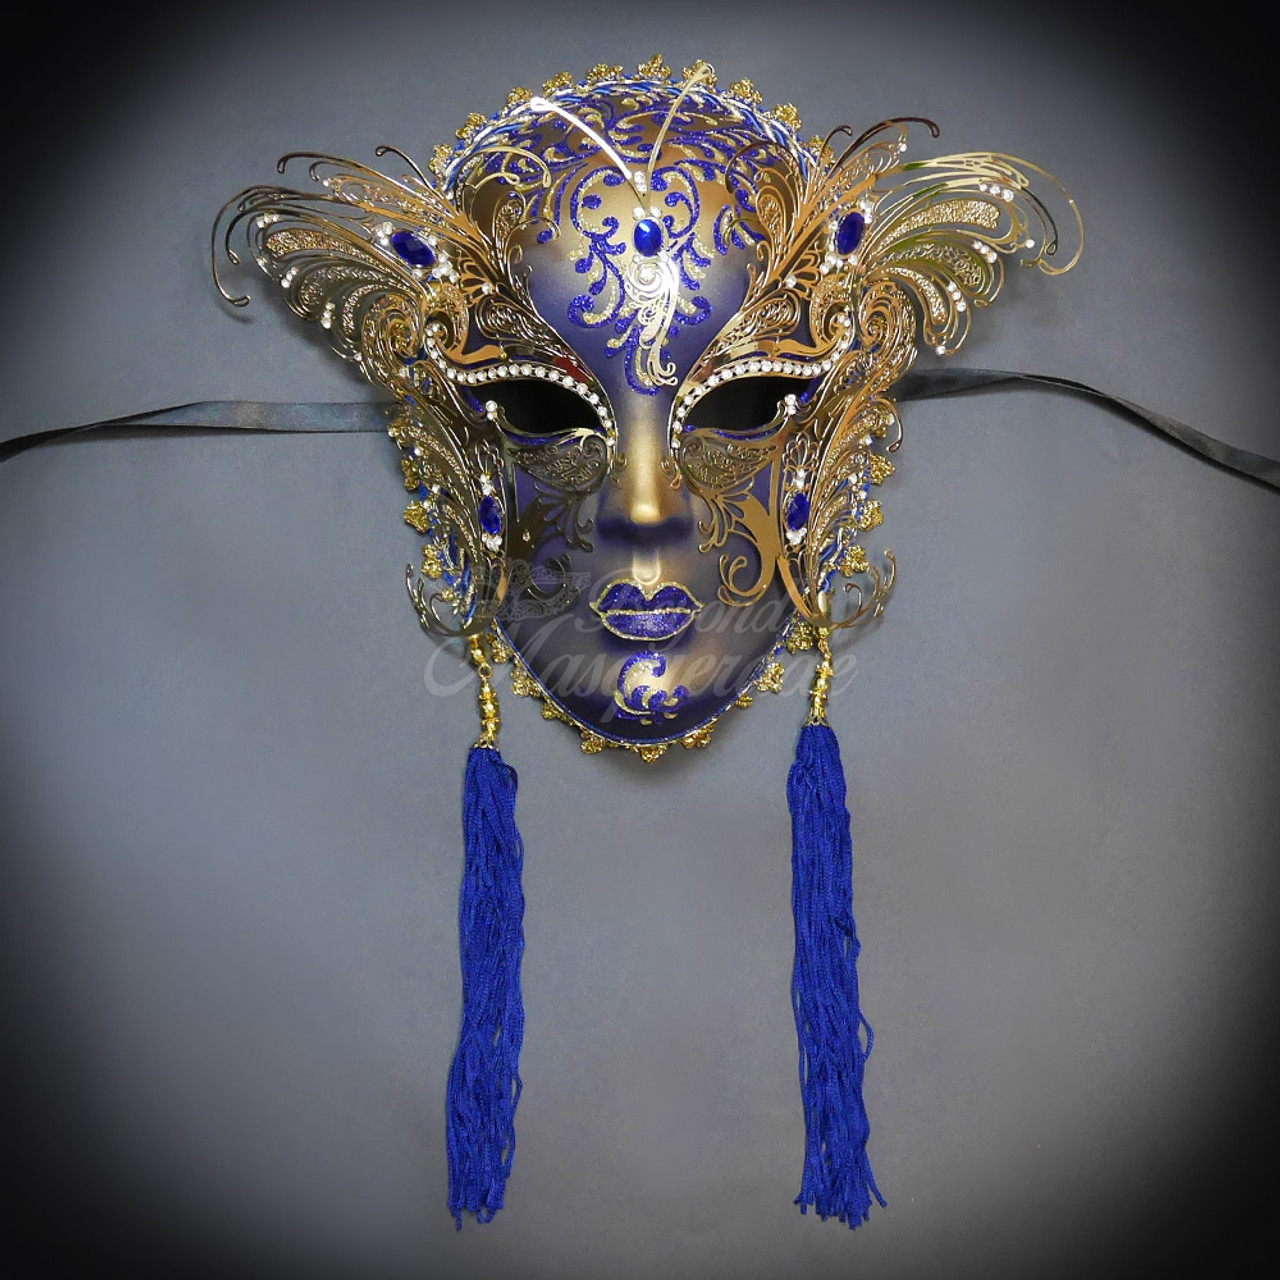 Wall Decor Masquerade Mask Masquerade Mask Venetian Masquerade Mask Gold   Blue Mask Mardi Gras Mask Masquerade Ball Mask